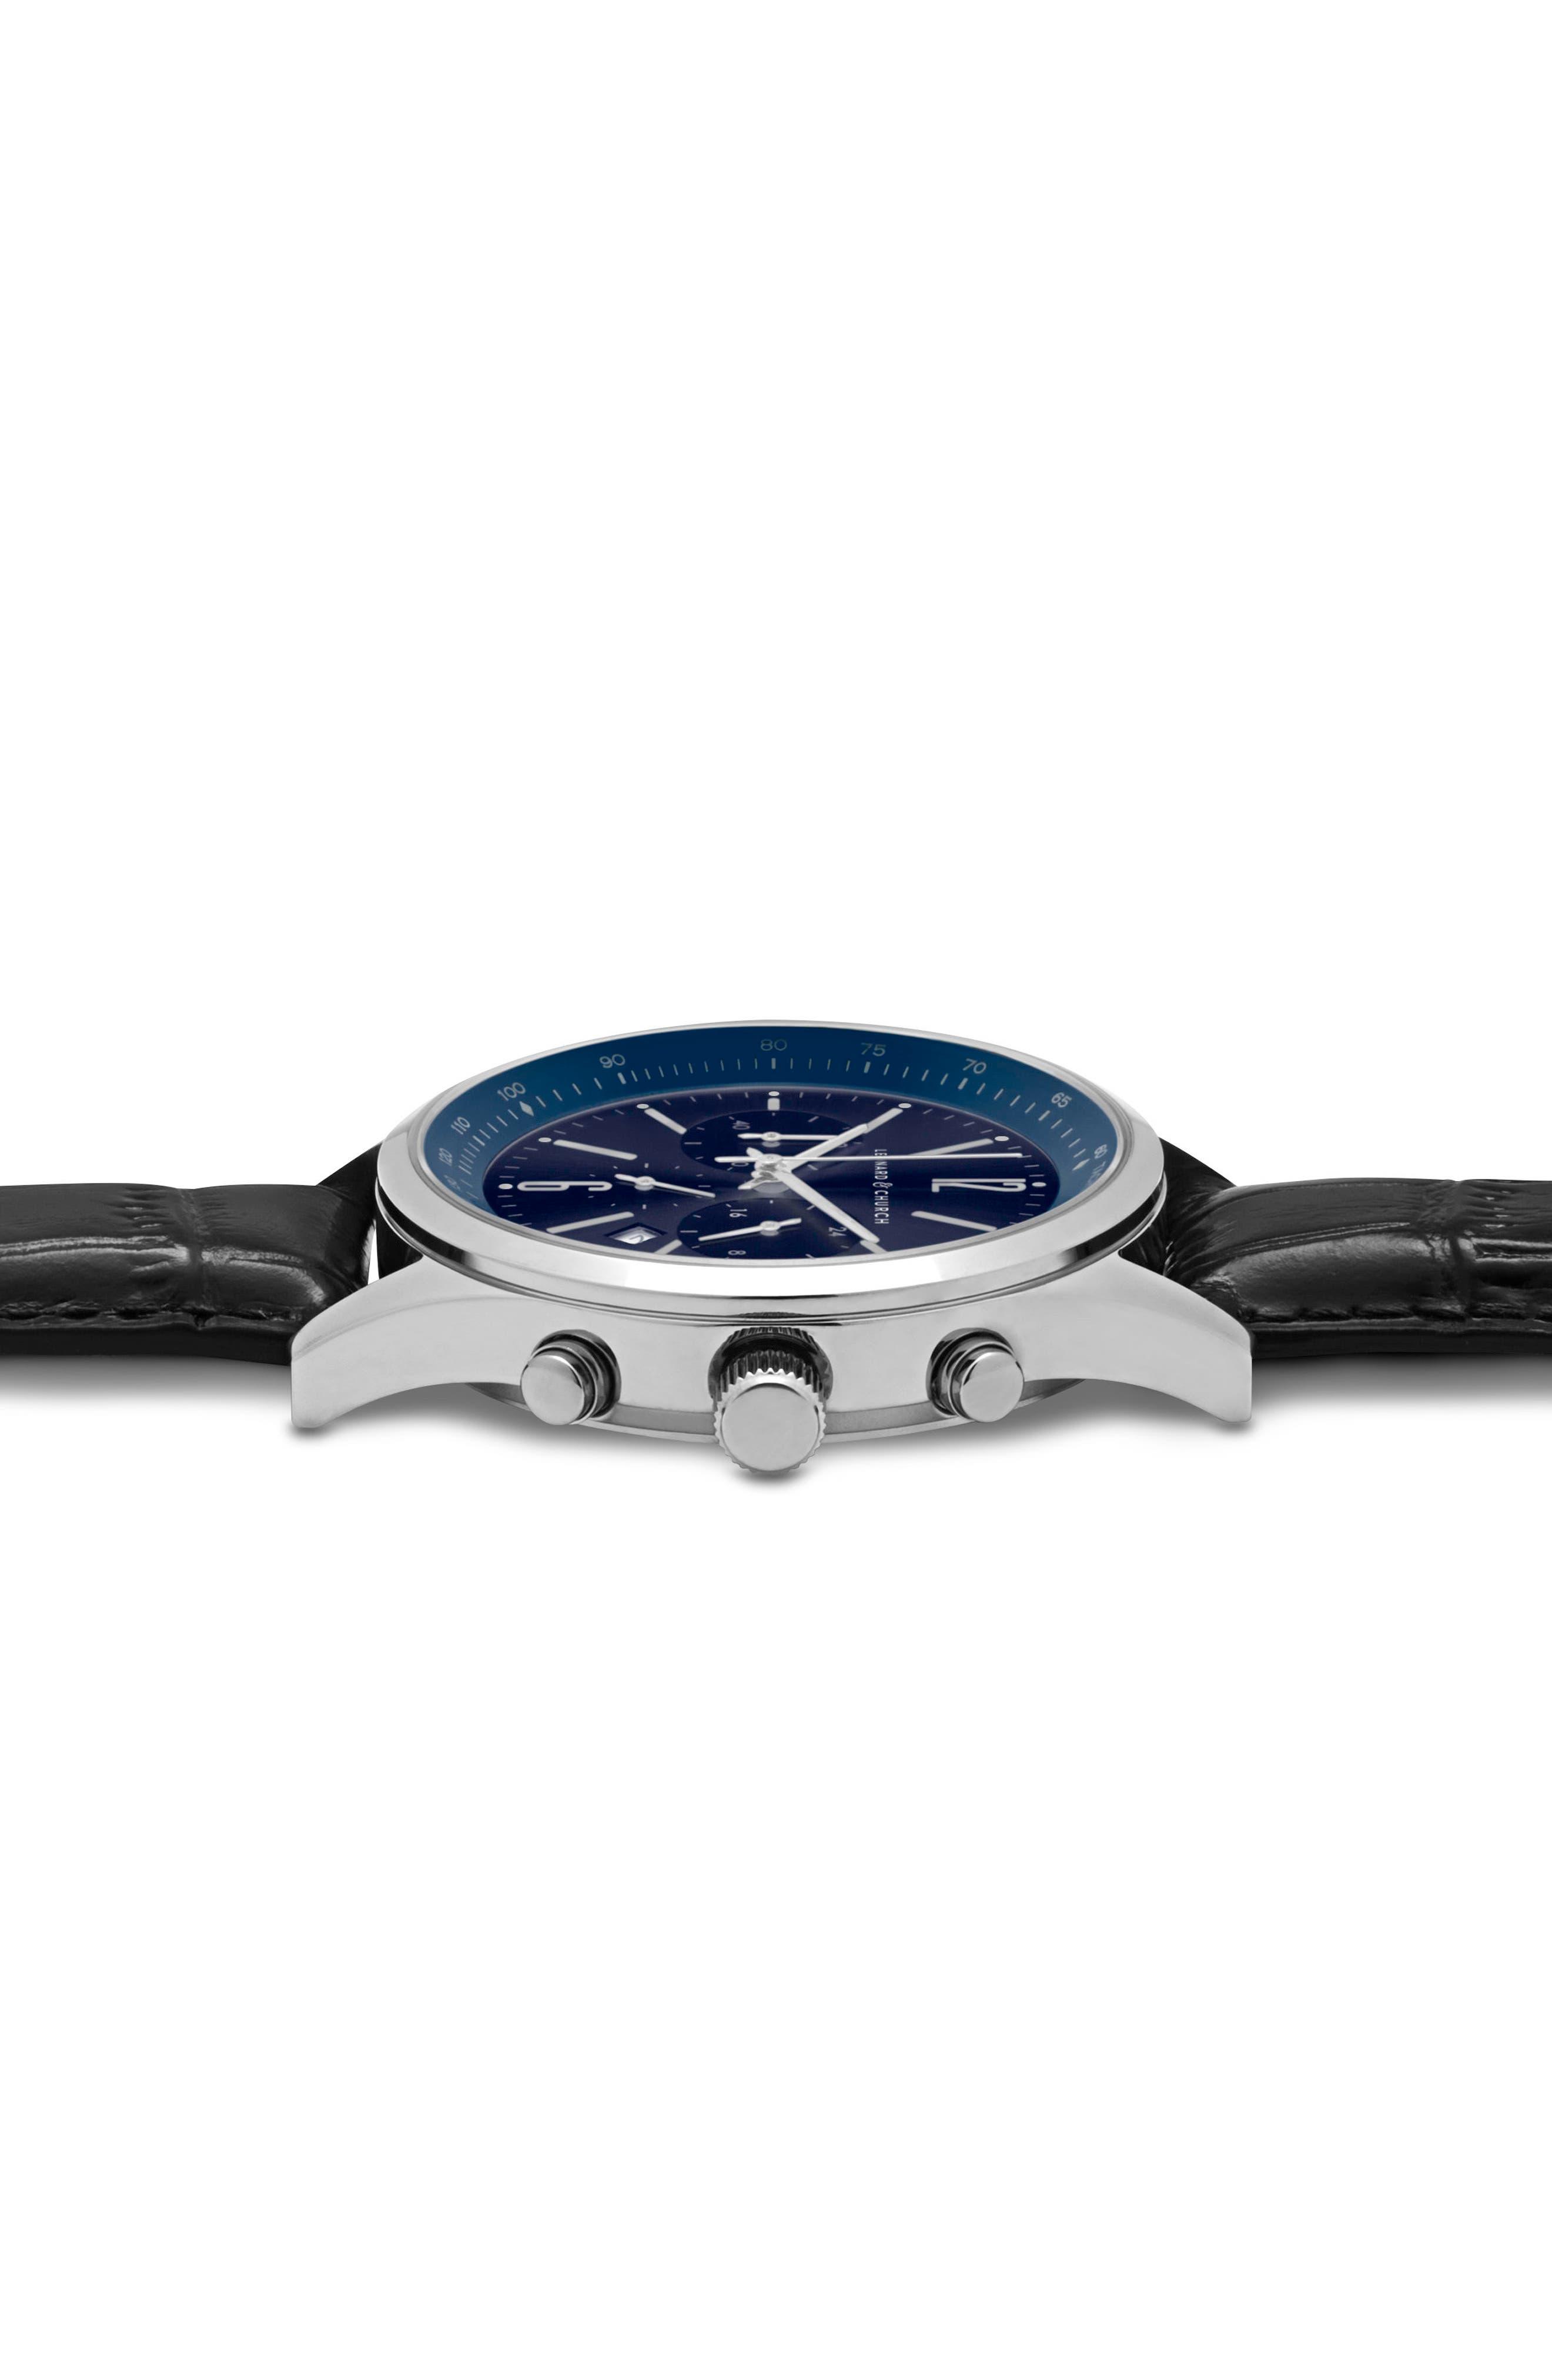 Leonard & Church Barclay Chronograph Leather Strap Watch, 43mm,                             Alternate thumbnail 7, color,                             Black/ Blue/ Silver